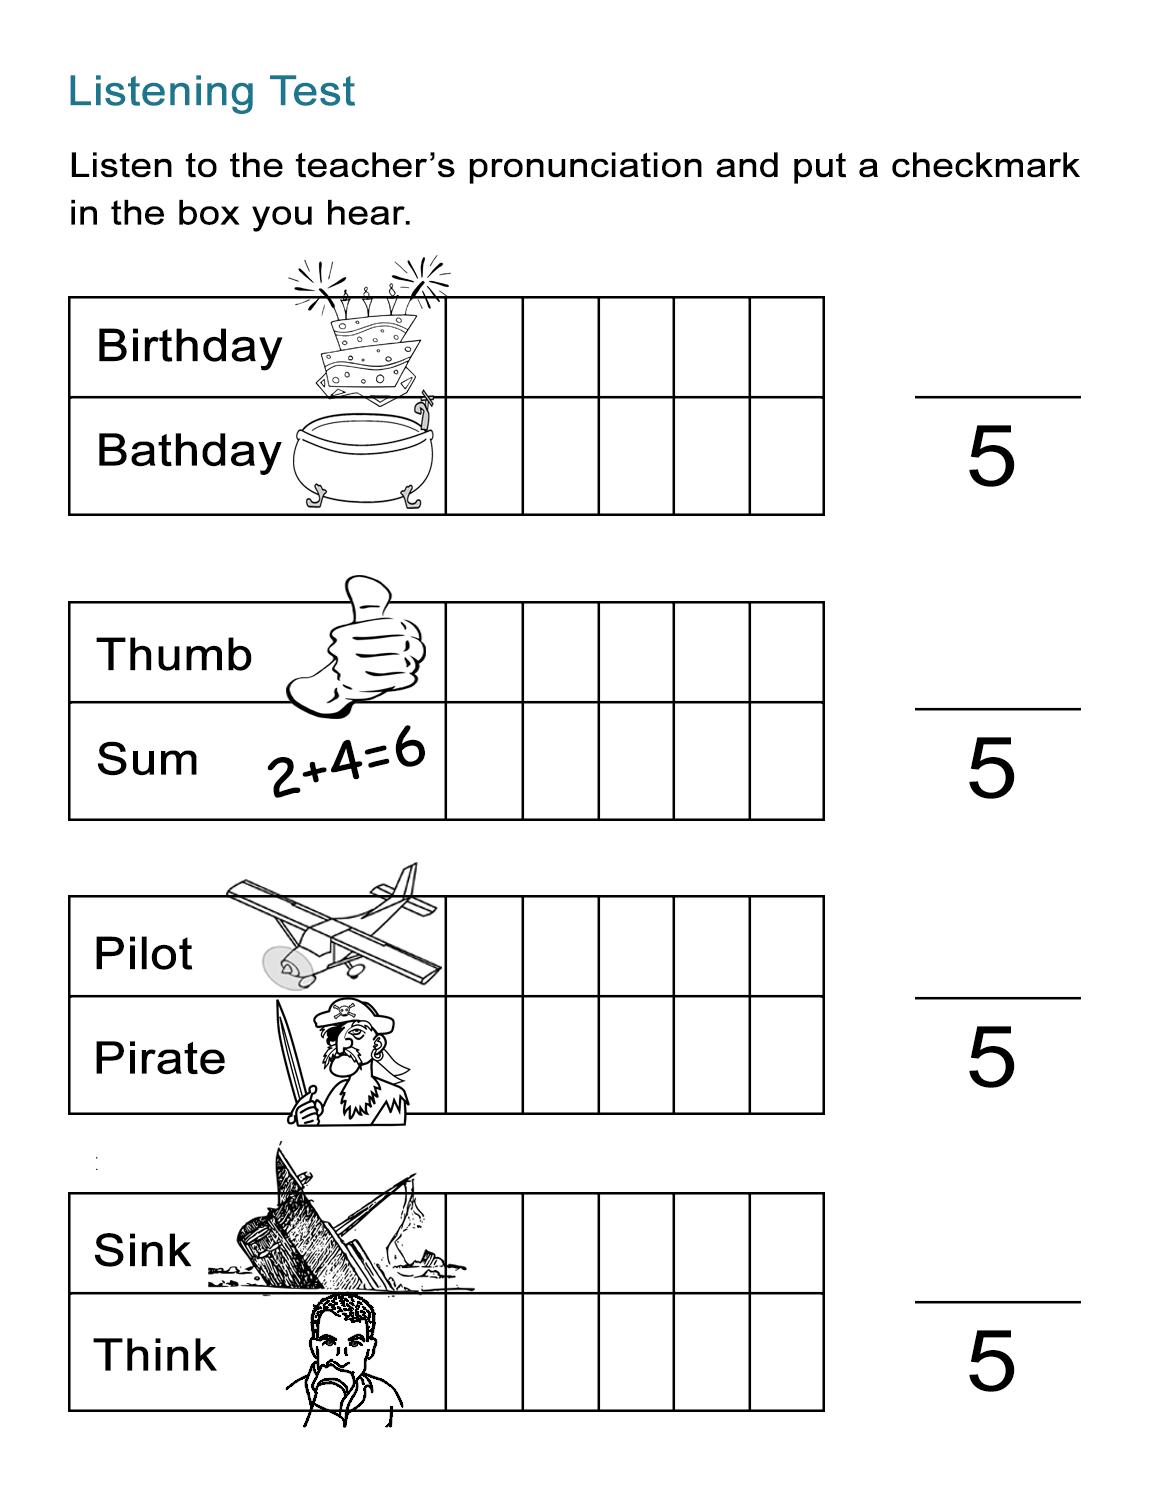 43 Free ESL Worksheets that Enable English Language Learners All ESL – Pronunciation Worksheets